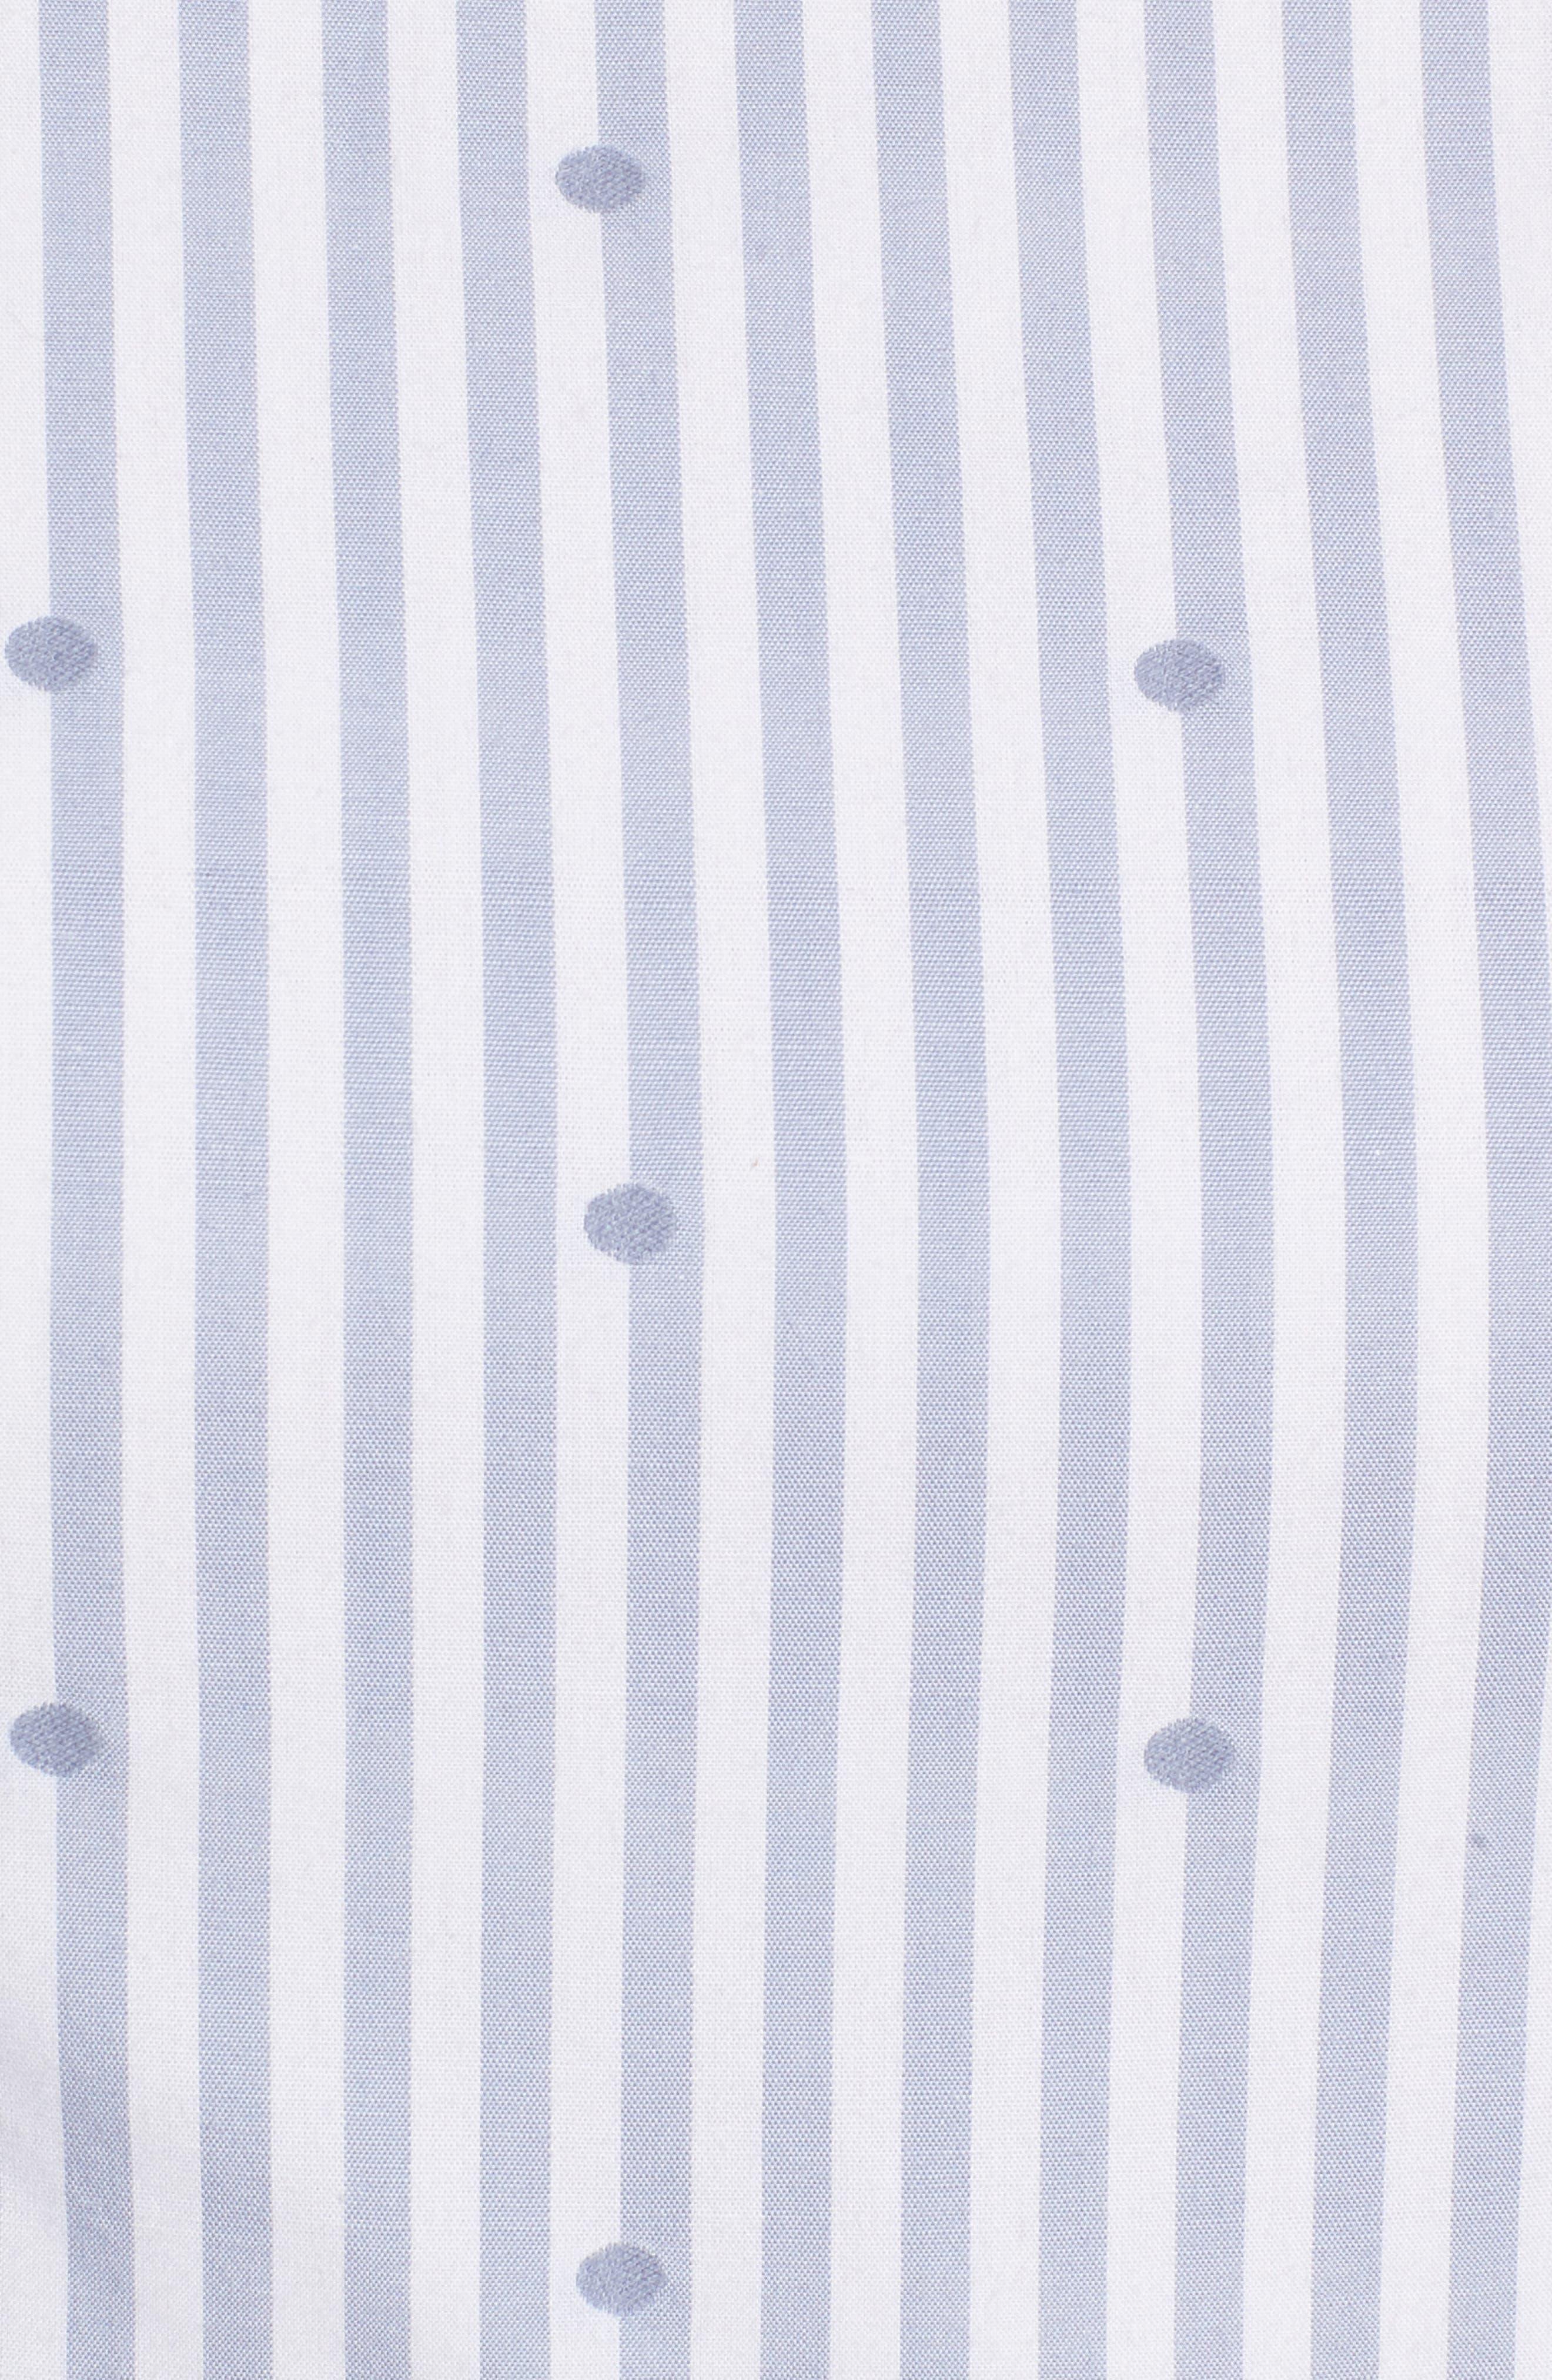 Stripe & Dot Cotton Dress,                             Alternate thumbnail 5, color,                             Eve Dot Stripe